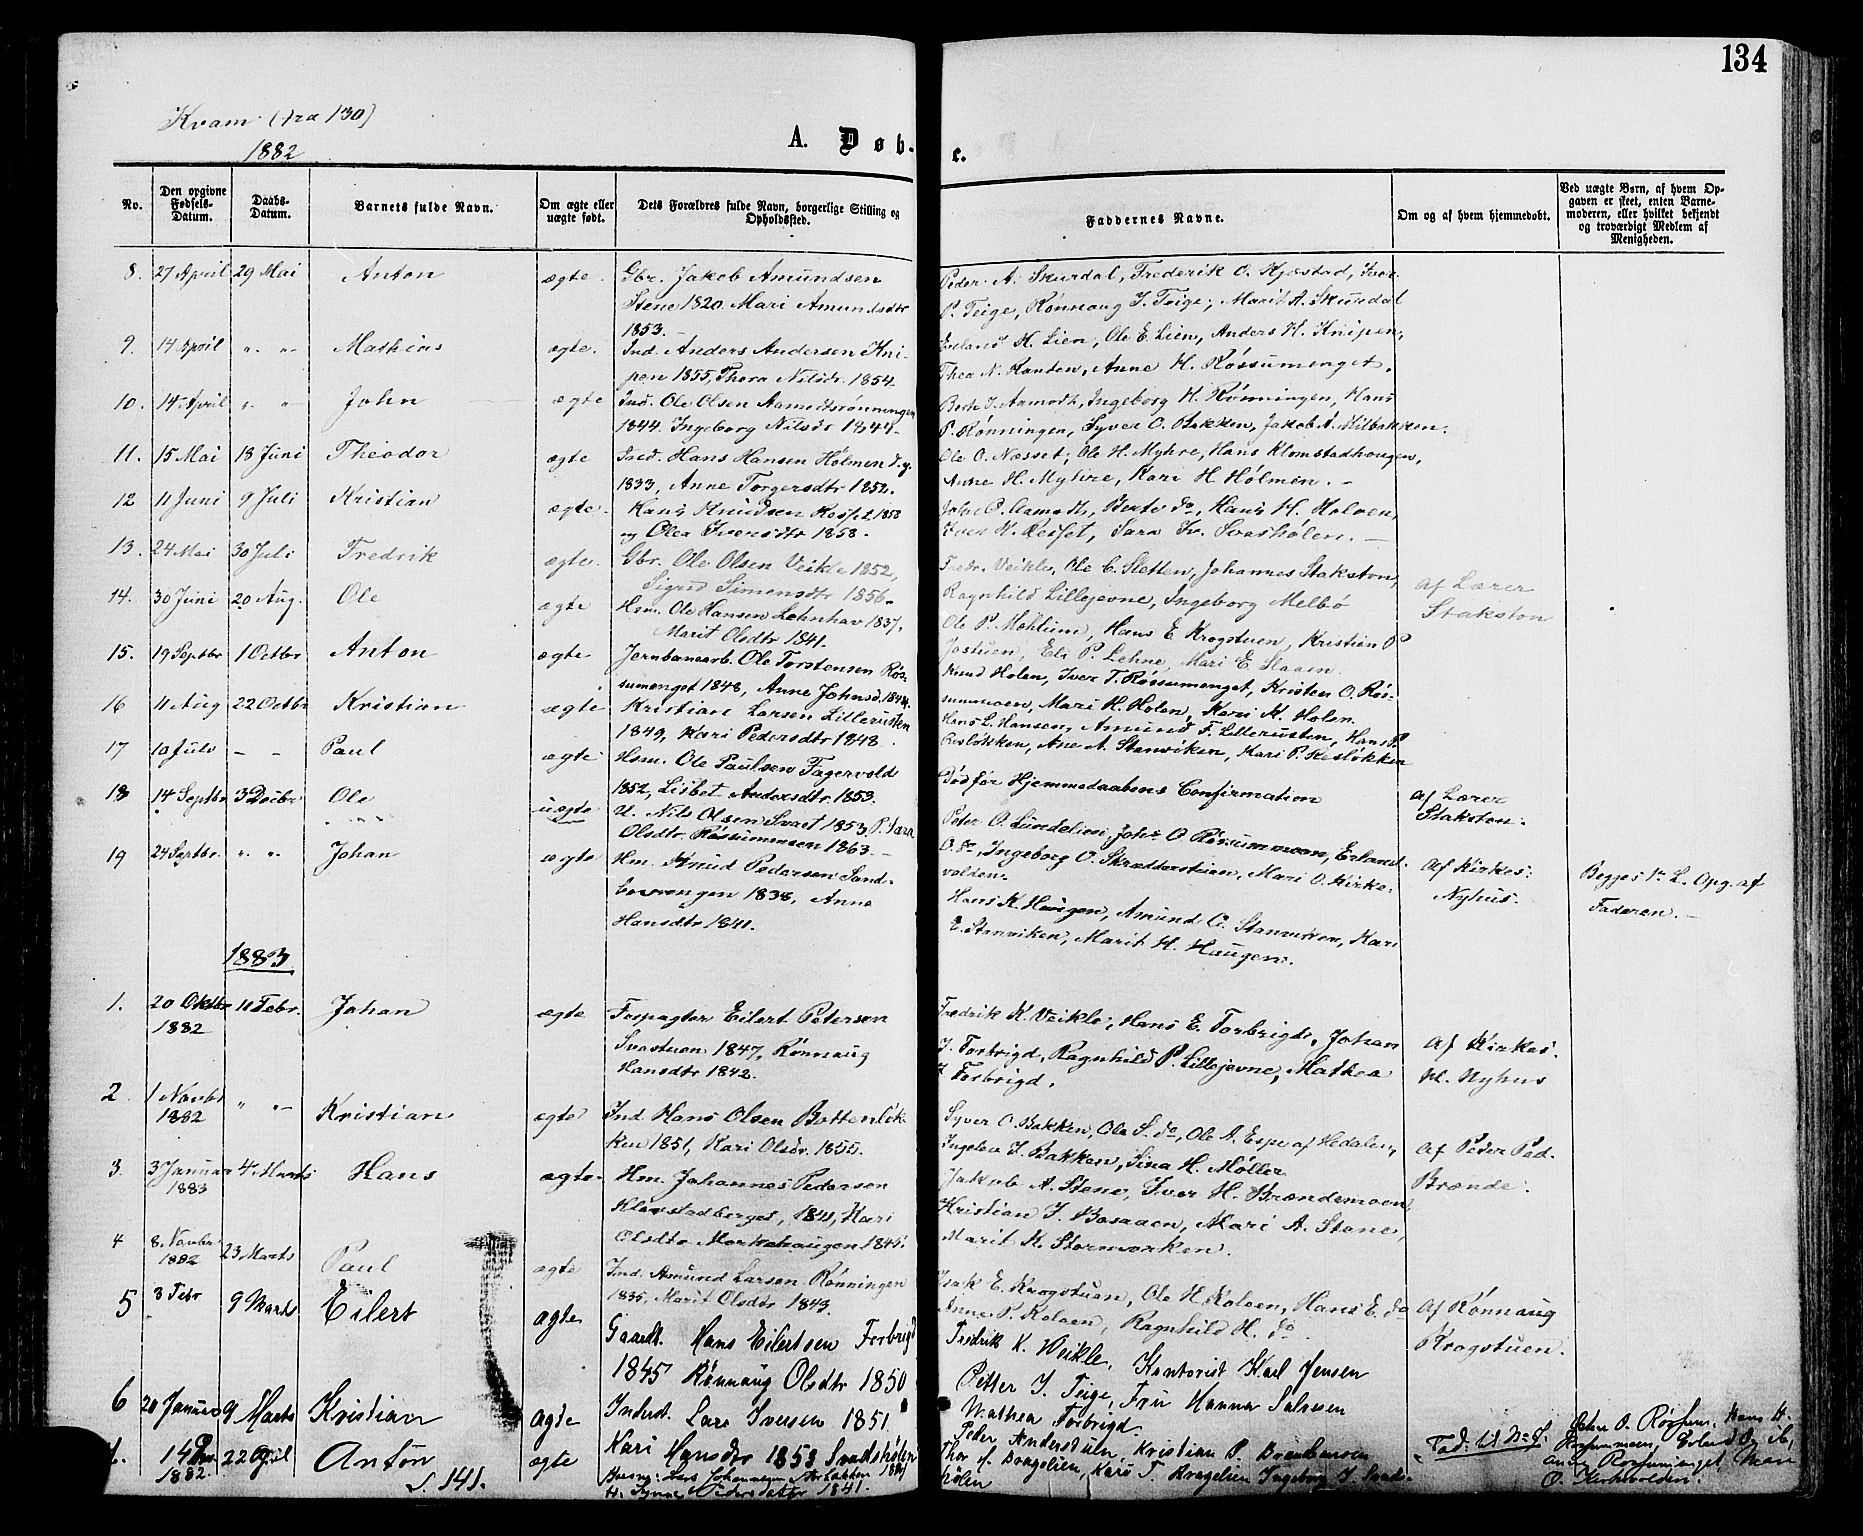 SAH, Nord-Fron prestekontor, Ministerialbok nr. 2, 1865-1883, s. 134